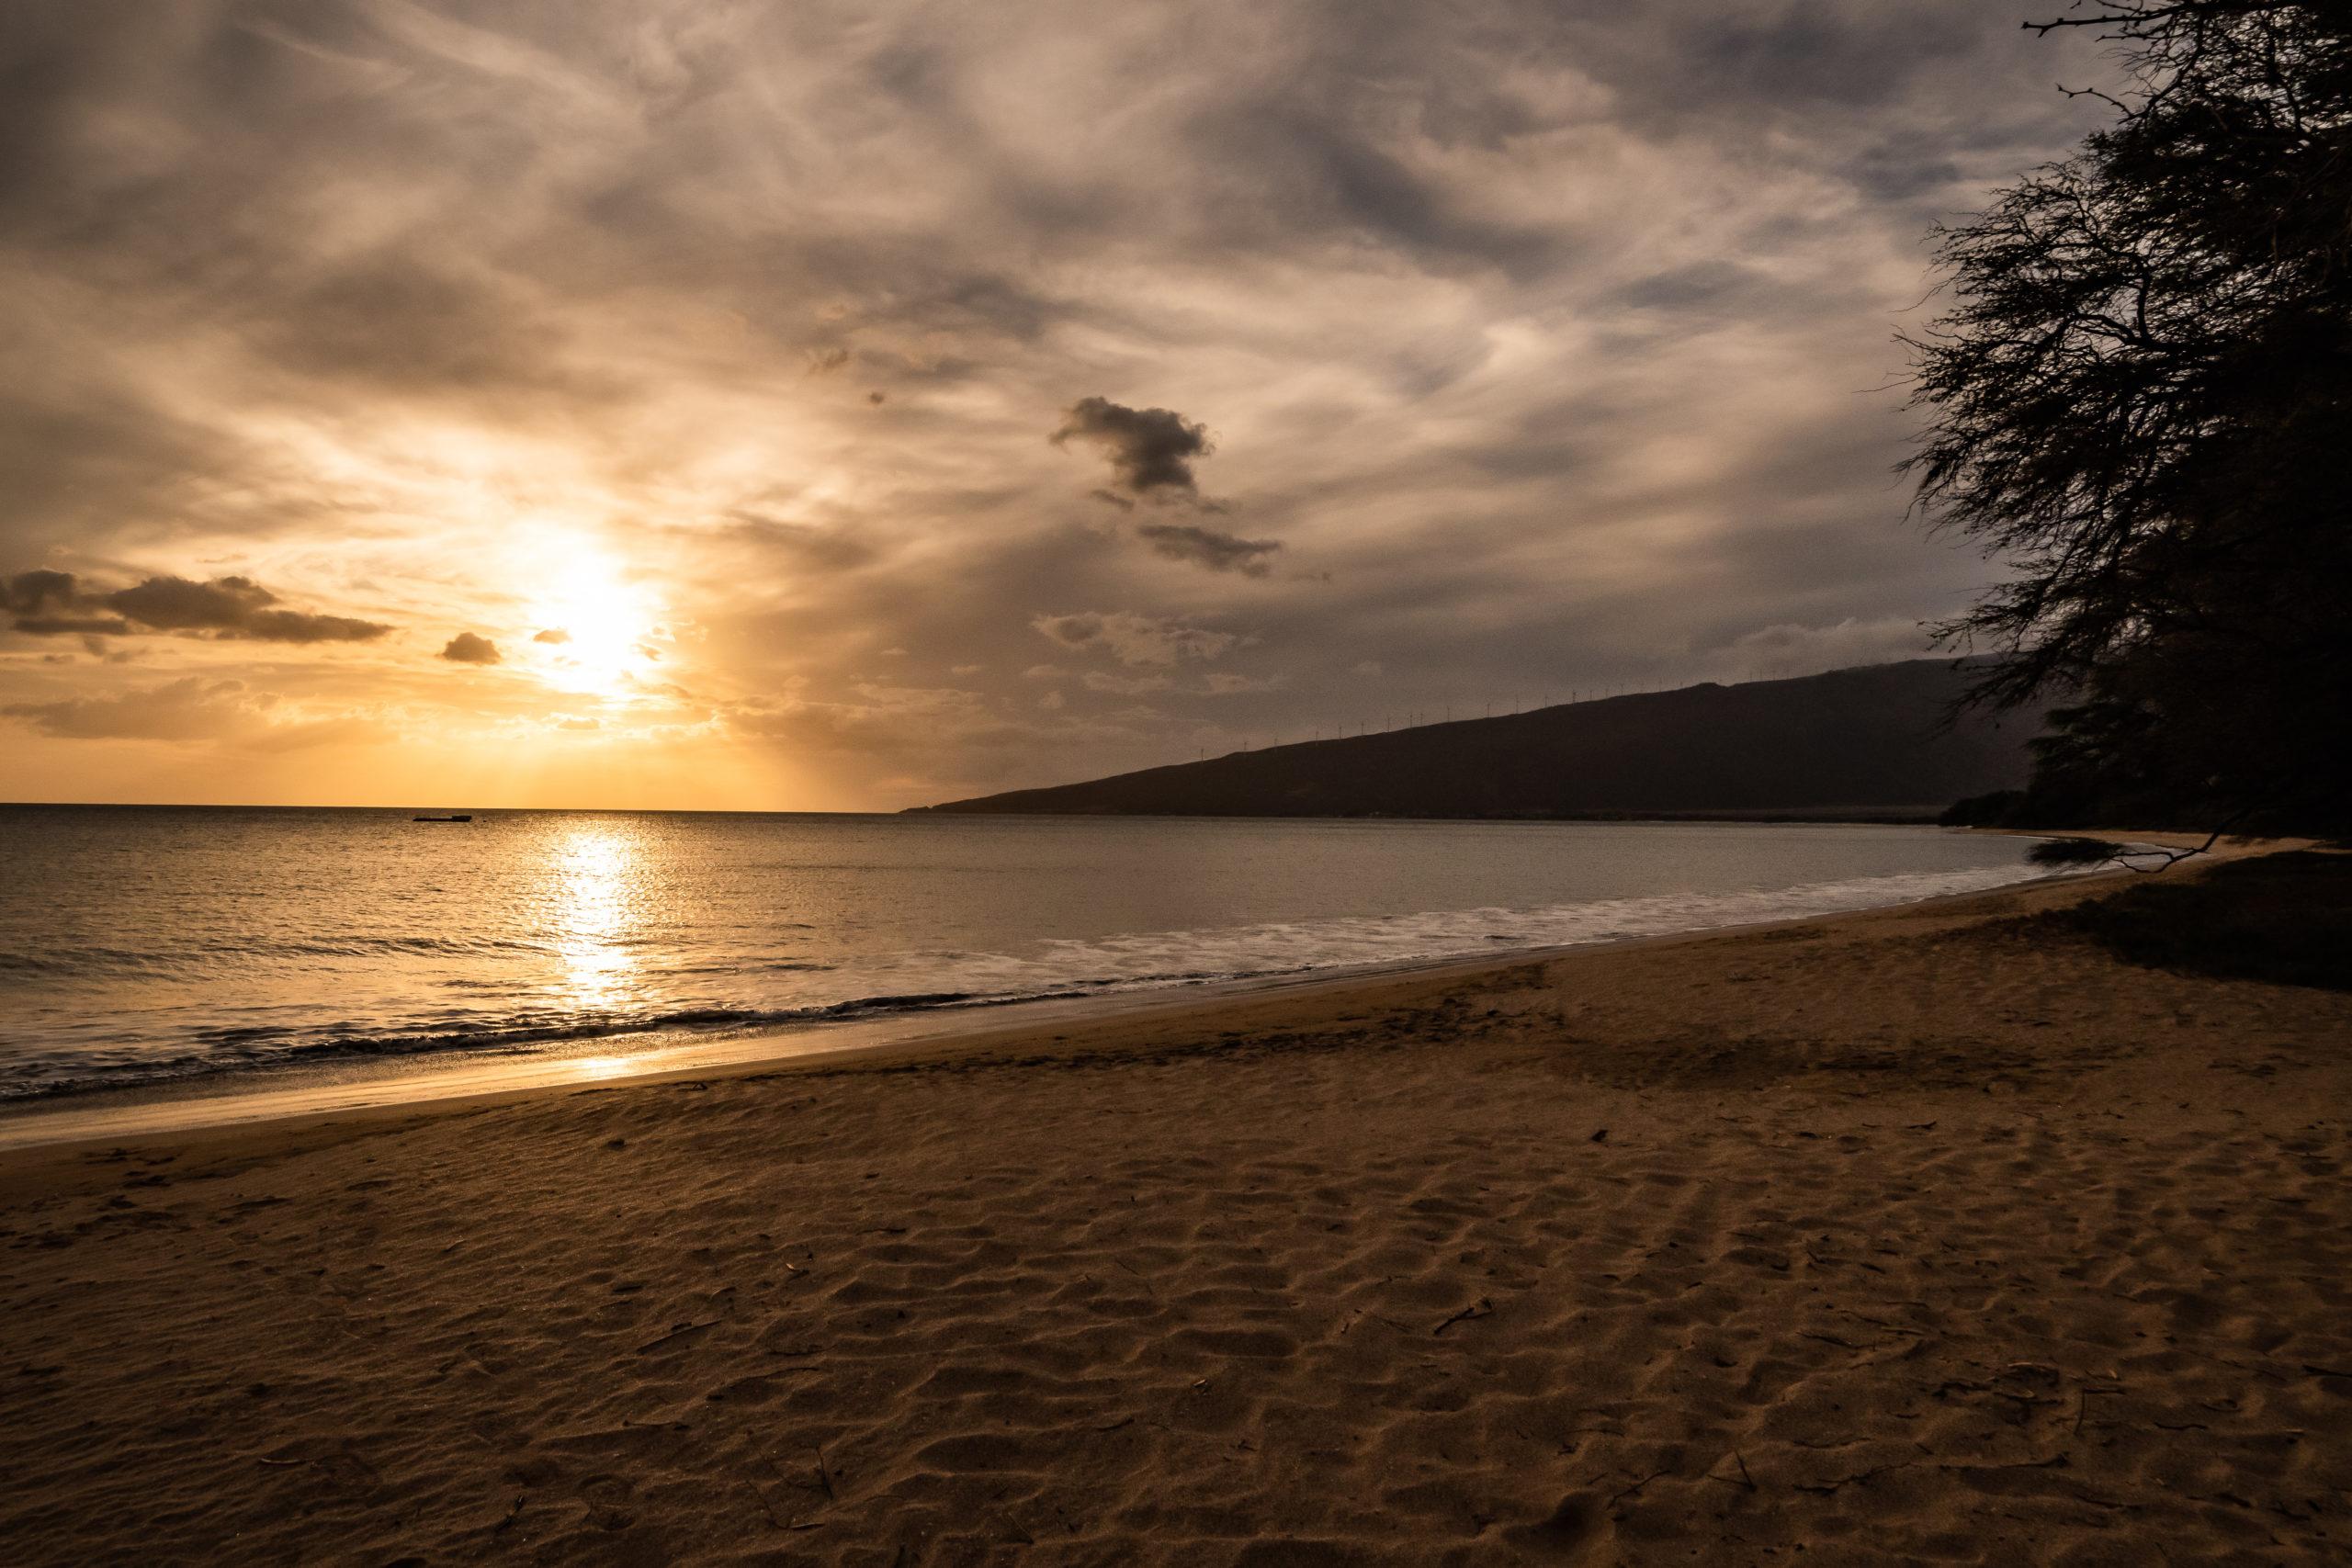 Beach Sunset, by John Monarch